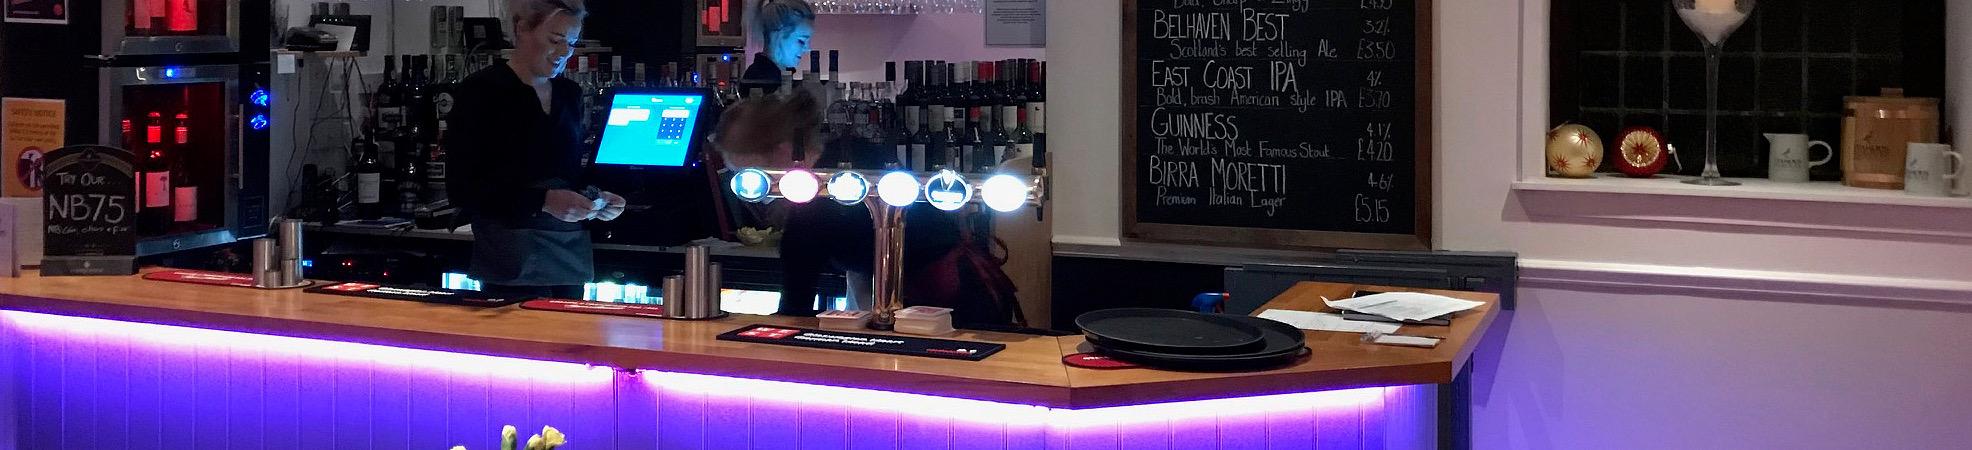 restaurants North Berwick